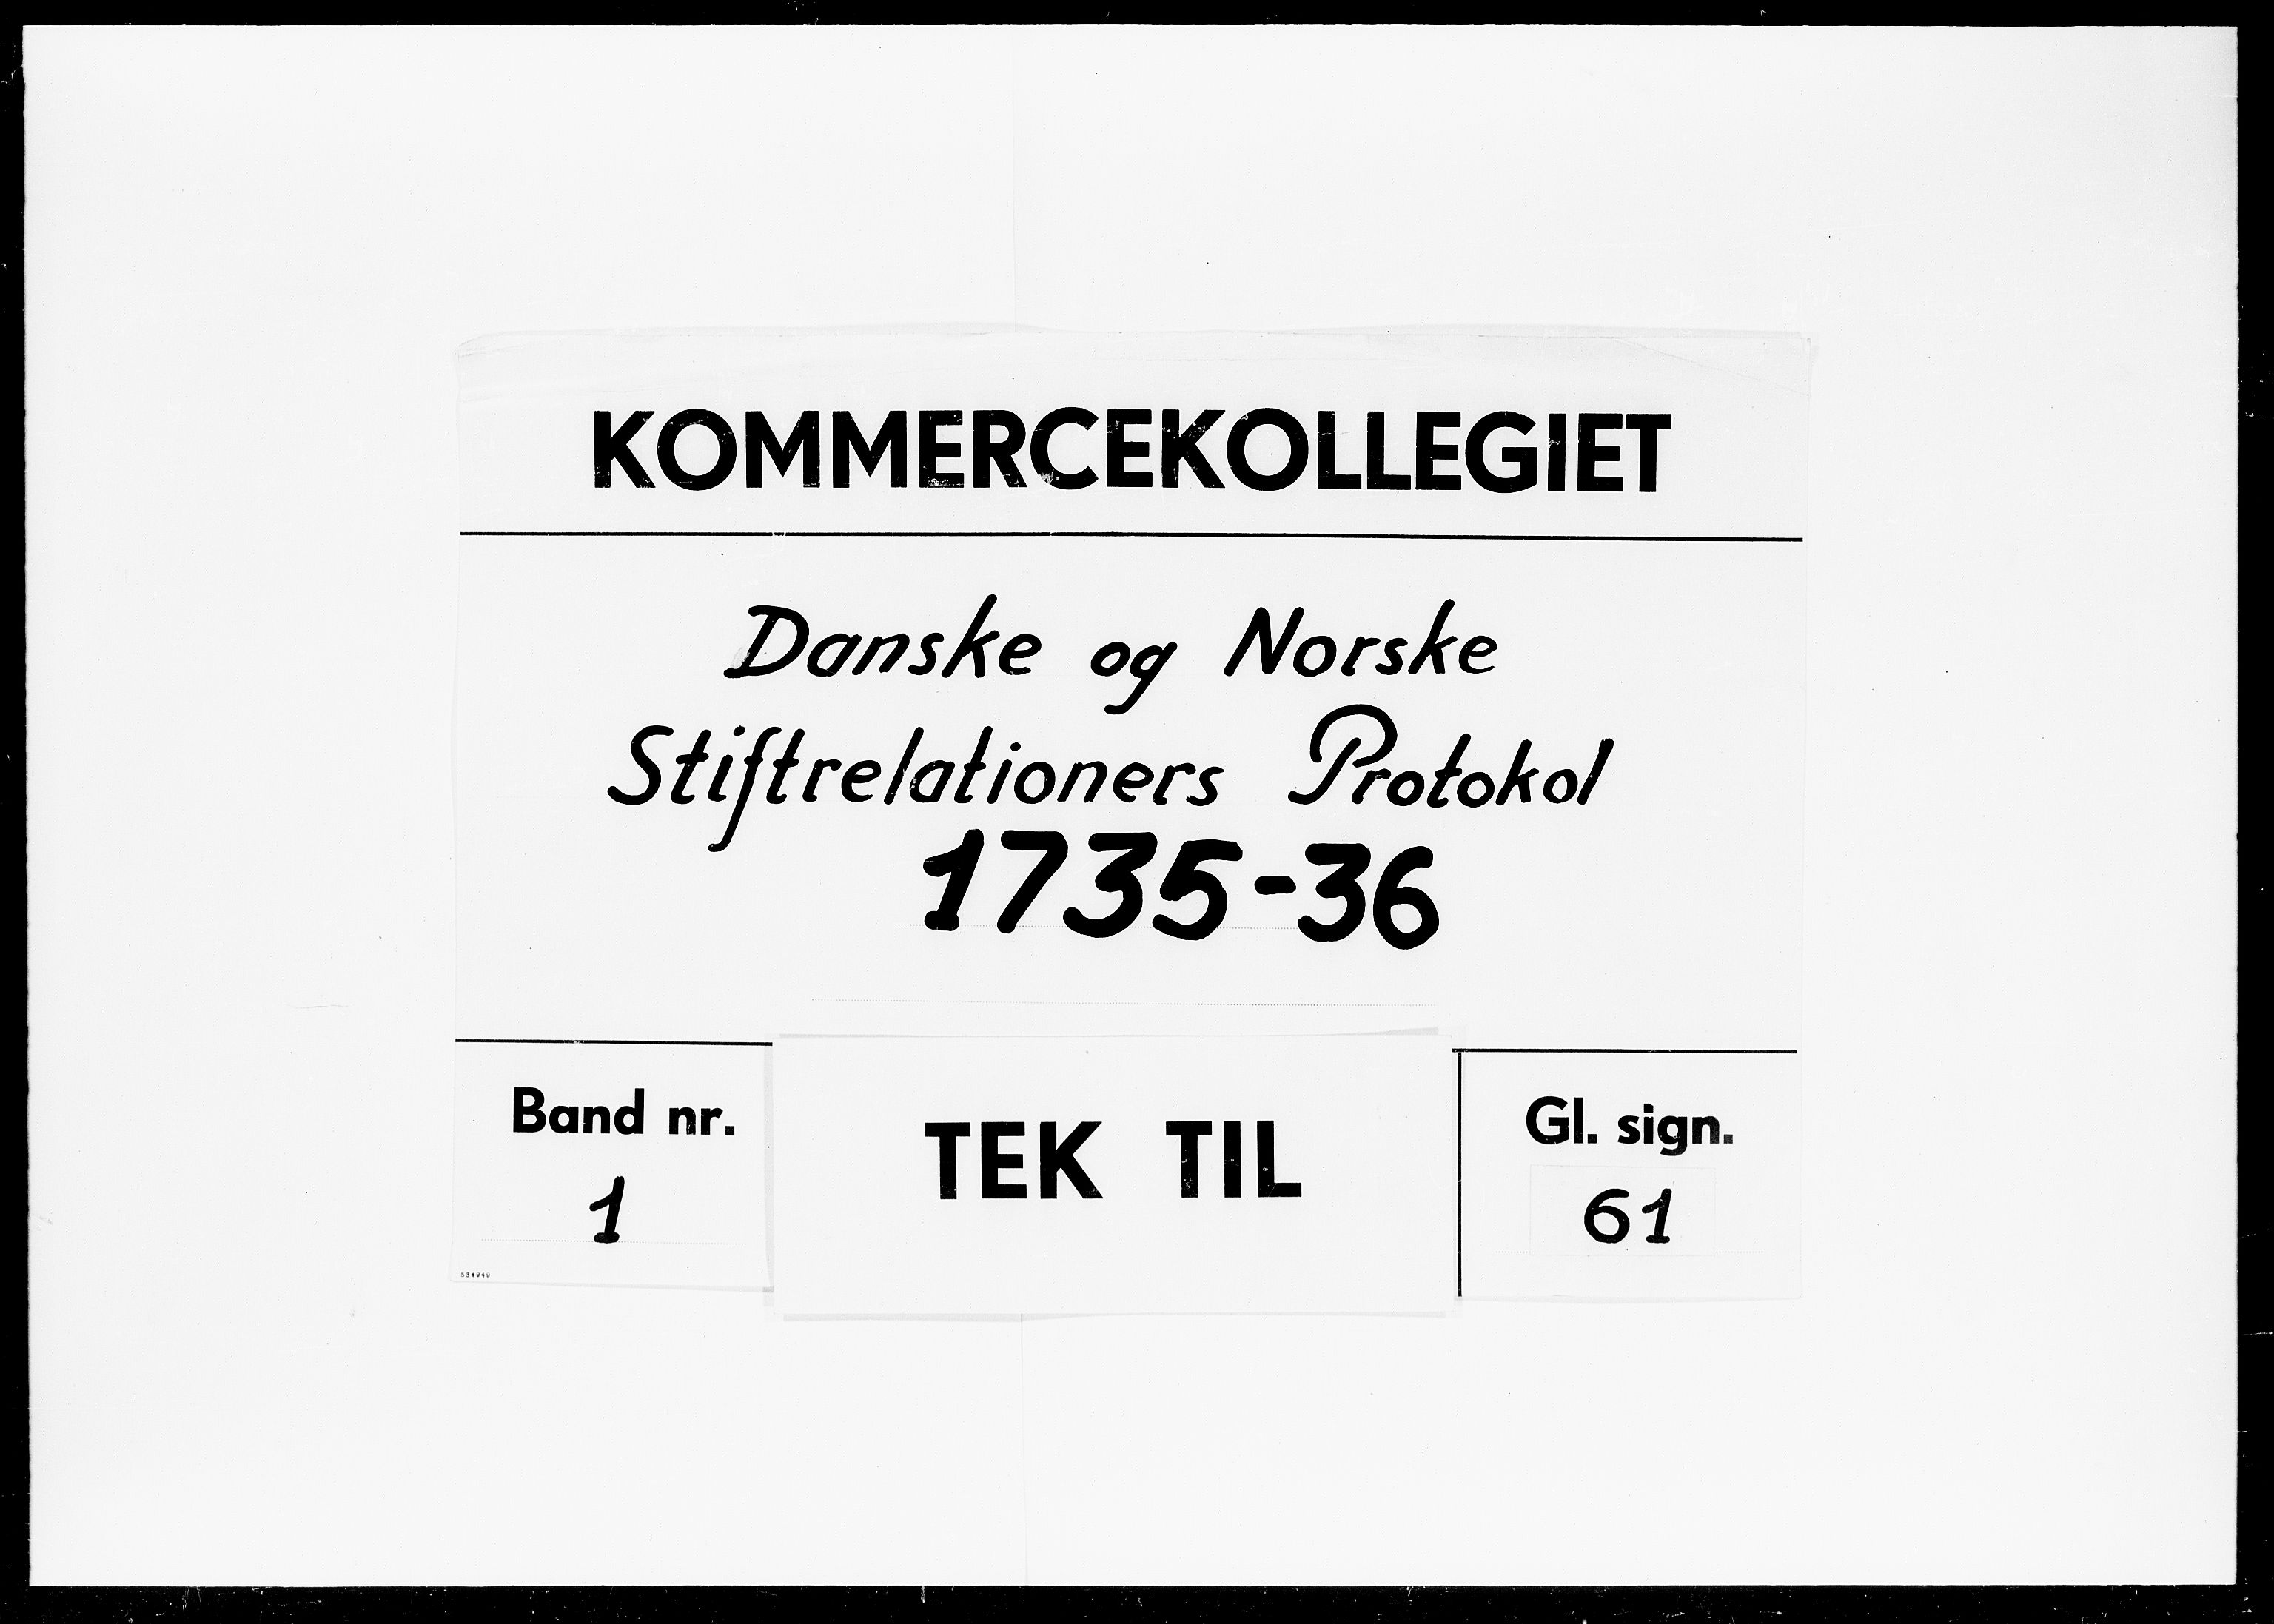 DRA, Kommercekollegiet, Dansk-Norske Sekretariat, -/25: Danske og Norske Stiftrelationers Protokol, 1735-1736